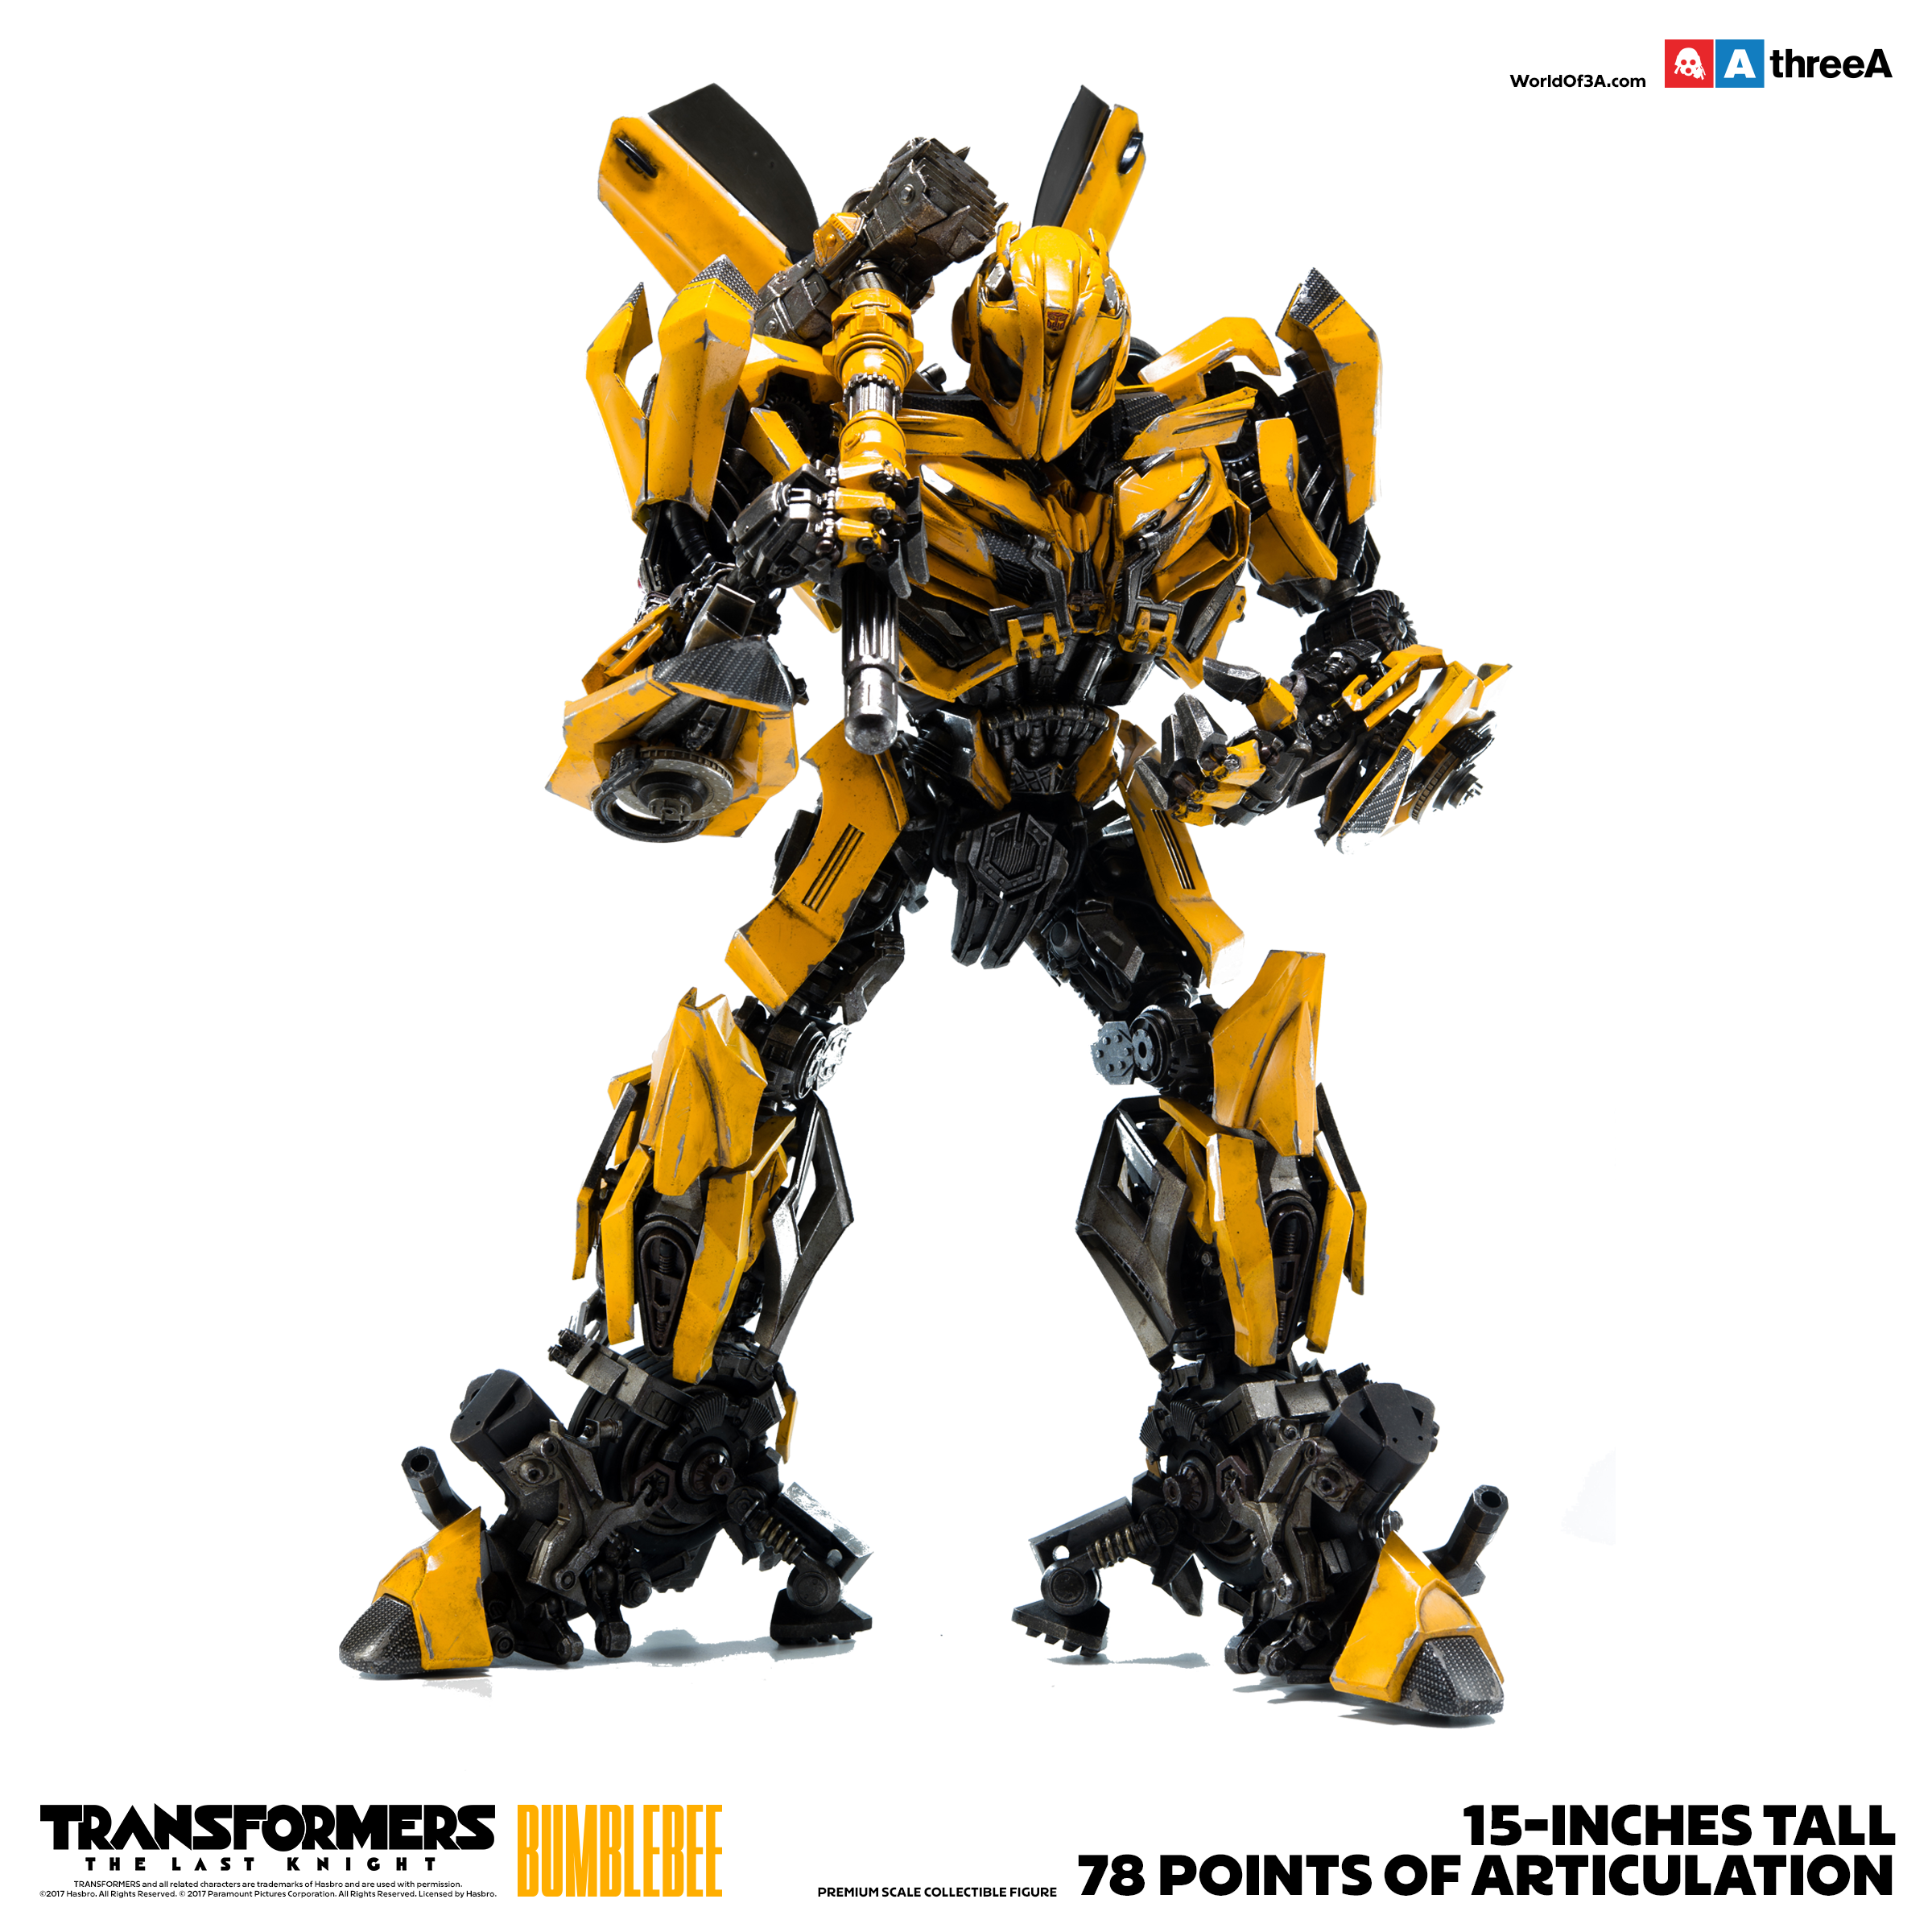 ThreeA - Bumblebee - Transformers - The last Knight | Archiv | 3Zero / 3A